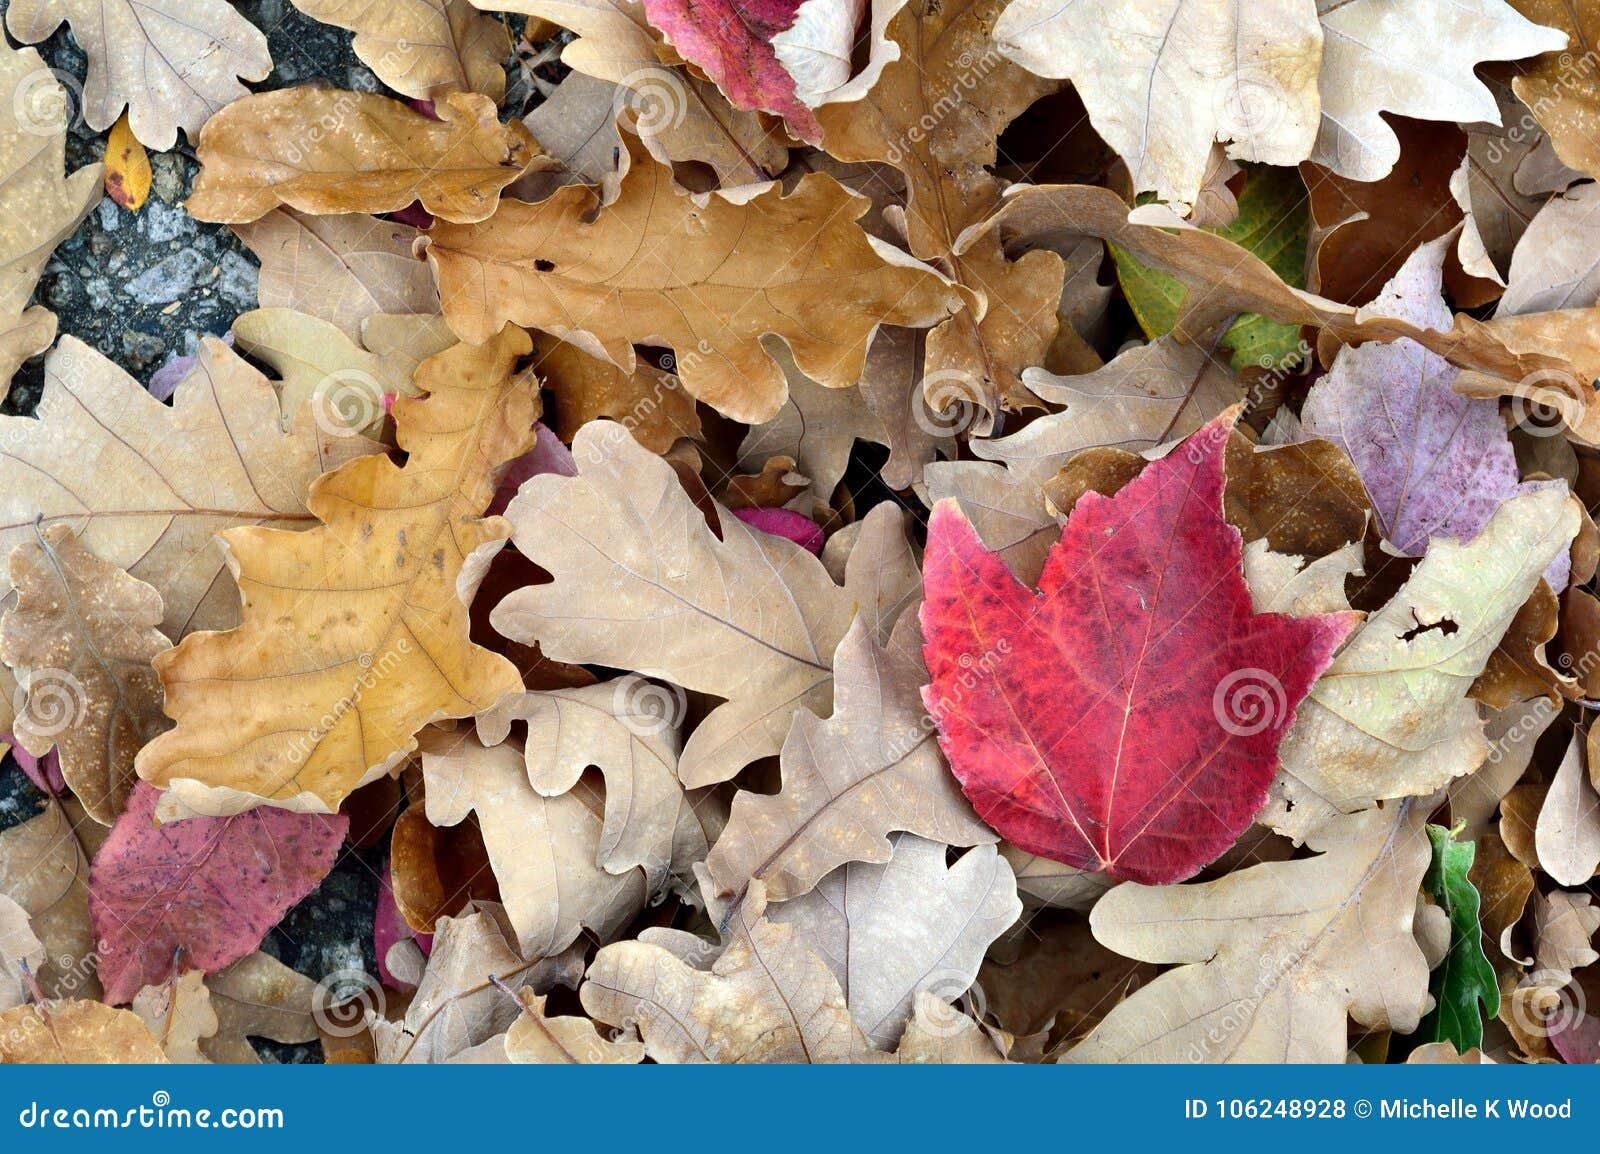 Fall Leaves White Oak Red Maple